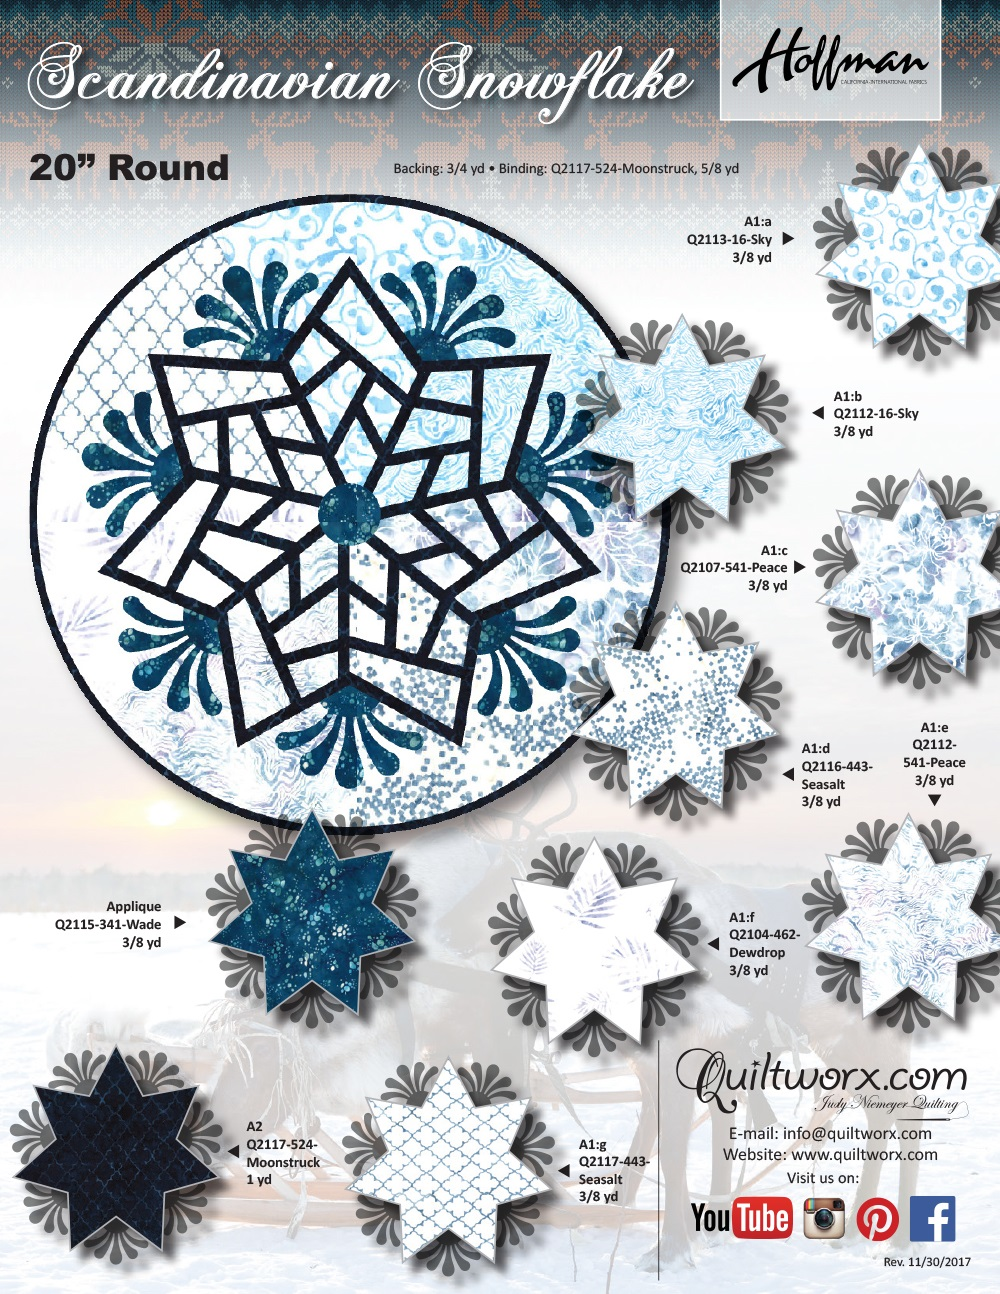 Scandinavian-Snowflake-(White)-Hoffman-KS-1